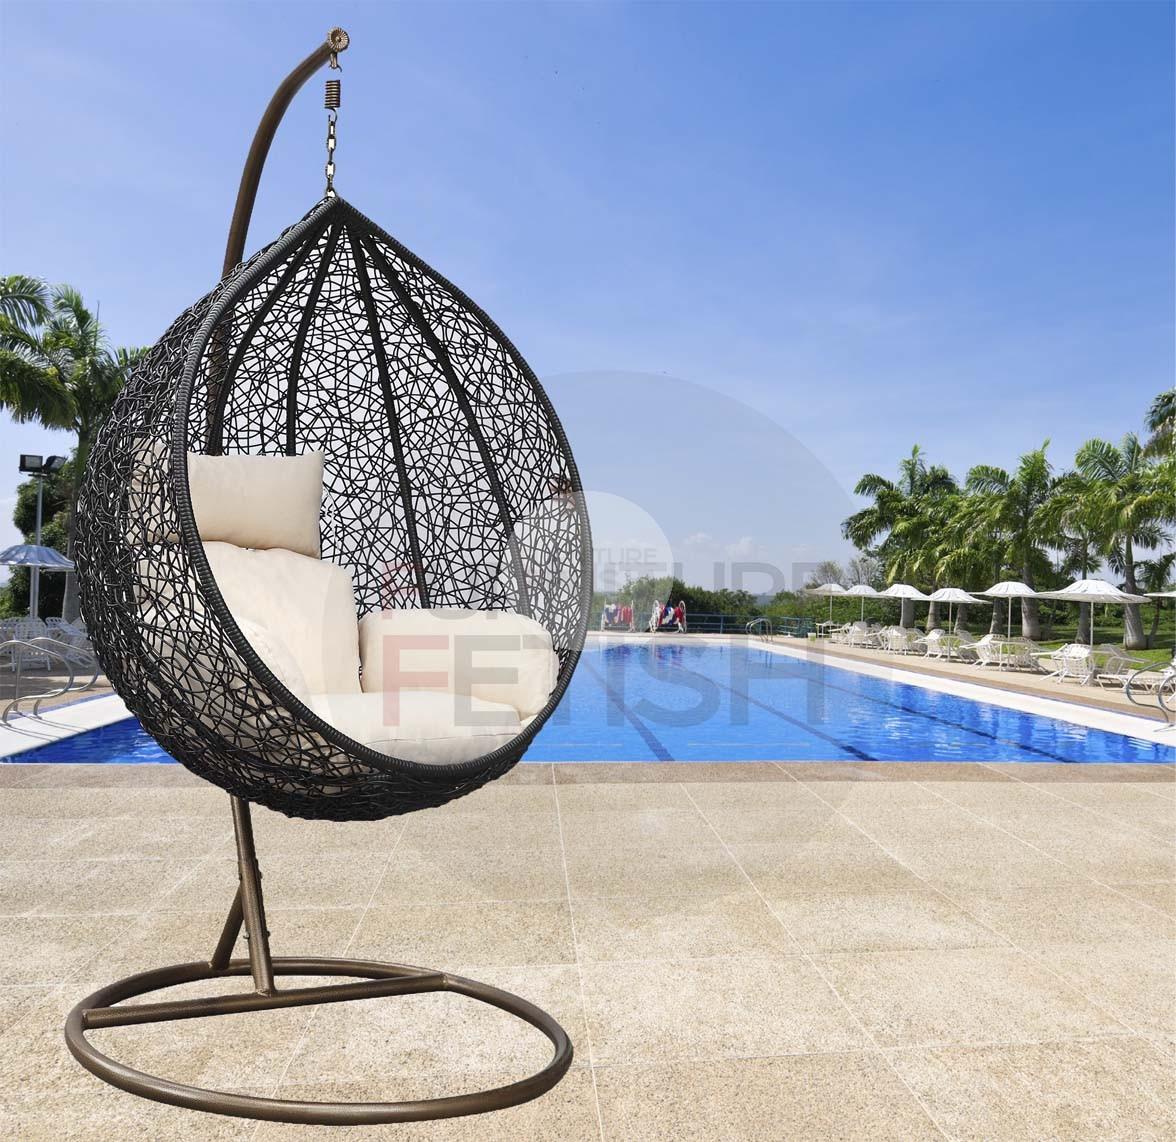 PVC Hanging Swing Chairs